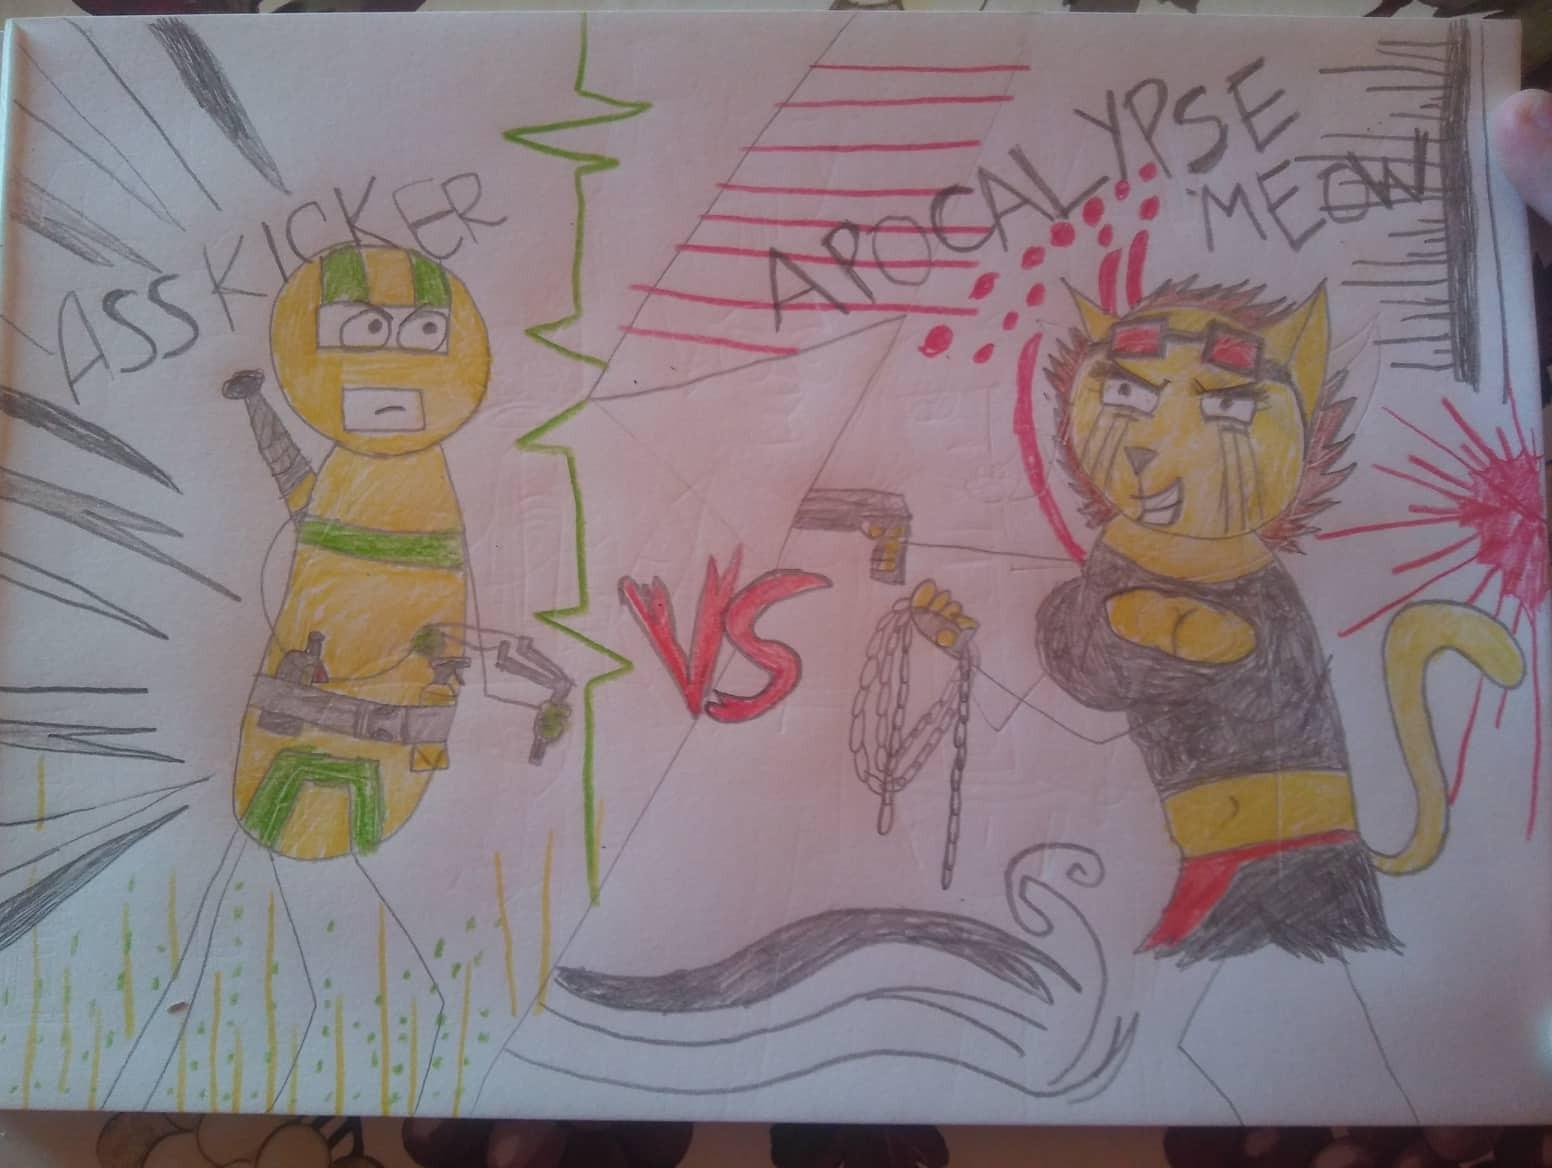 Ass Kicker VS Apocalypse Meow